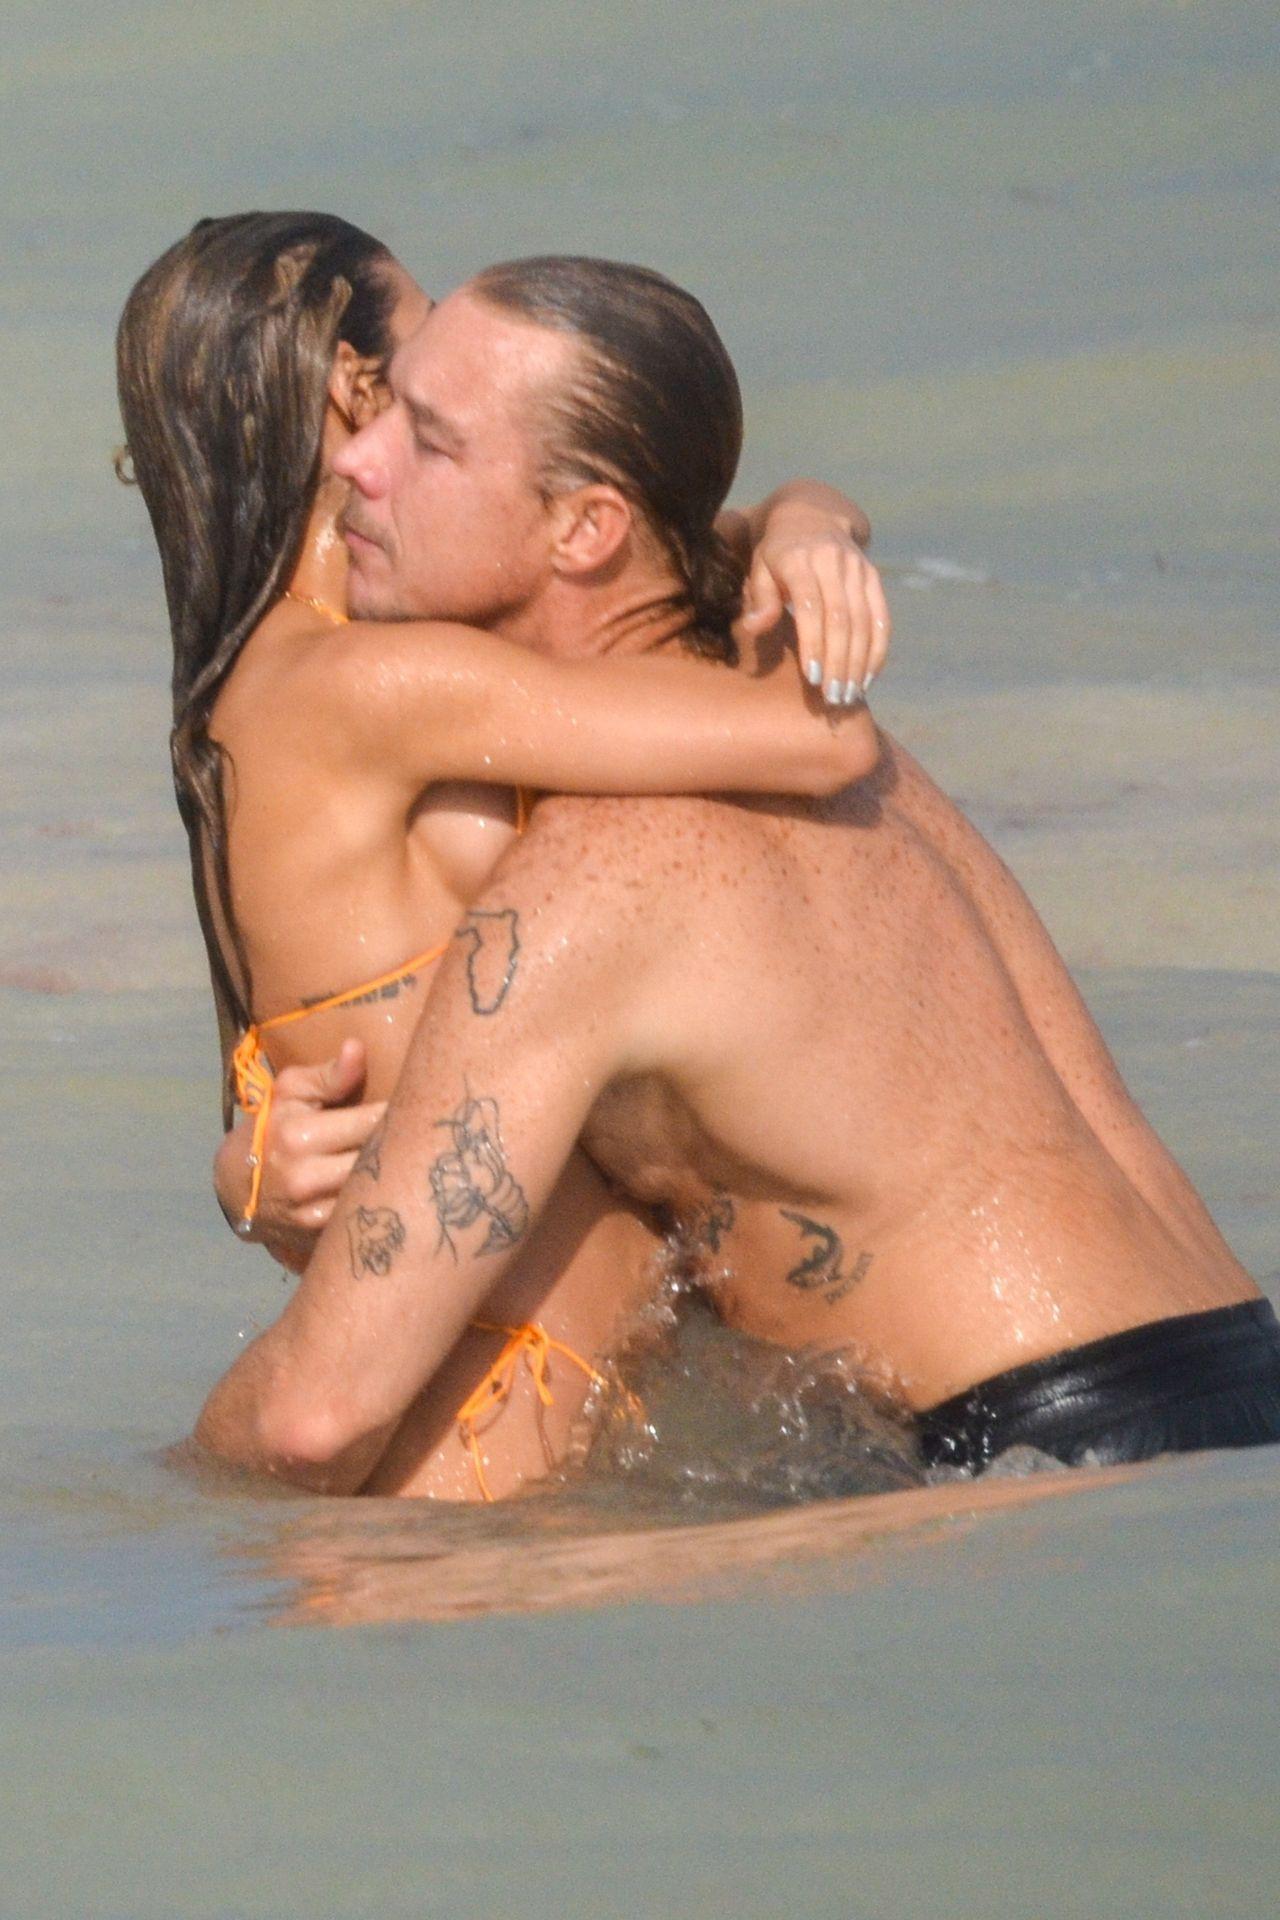 Chantel Jeffries And Dj Diplo Take Their New Love To Mexico 0033